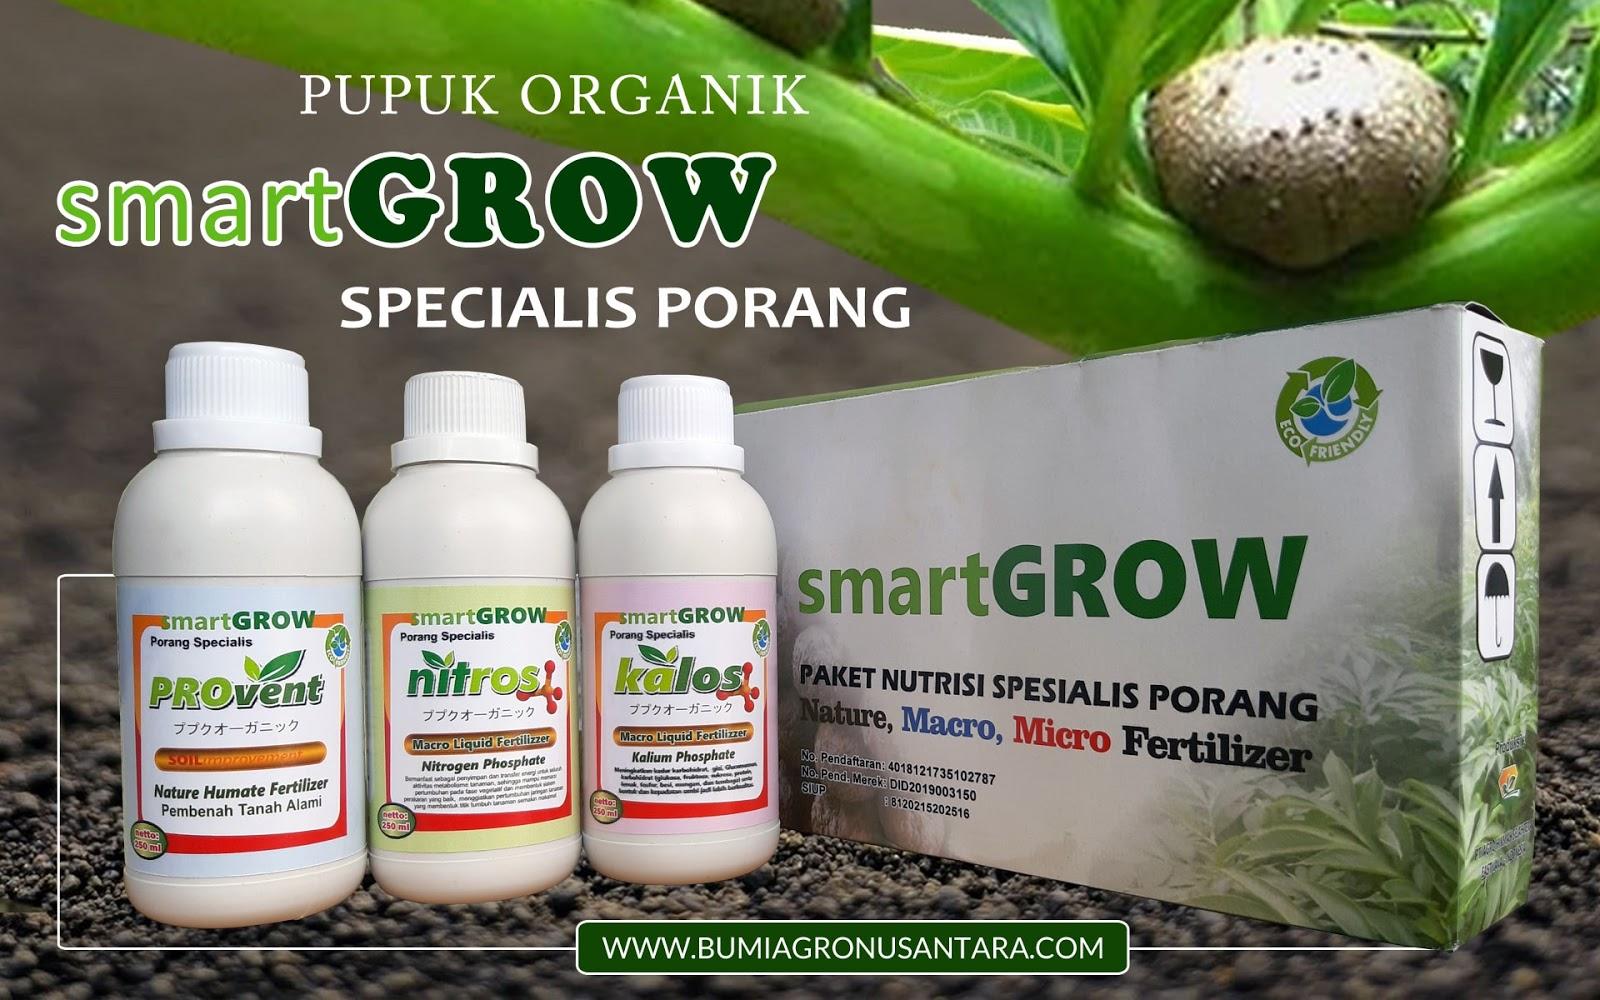 pupuk porang, pupuk porang organik, popok porang smartgrow, pupuk porang kimia, pupuk porang terbaik, pupuk porang terpercaya,